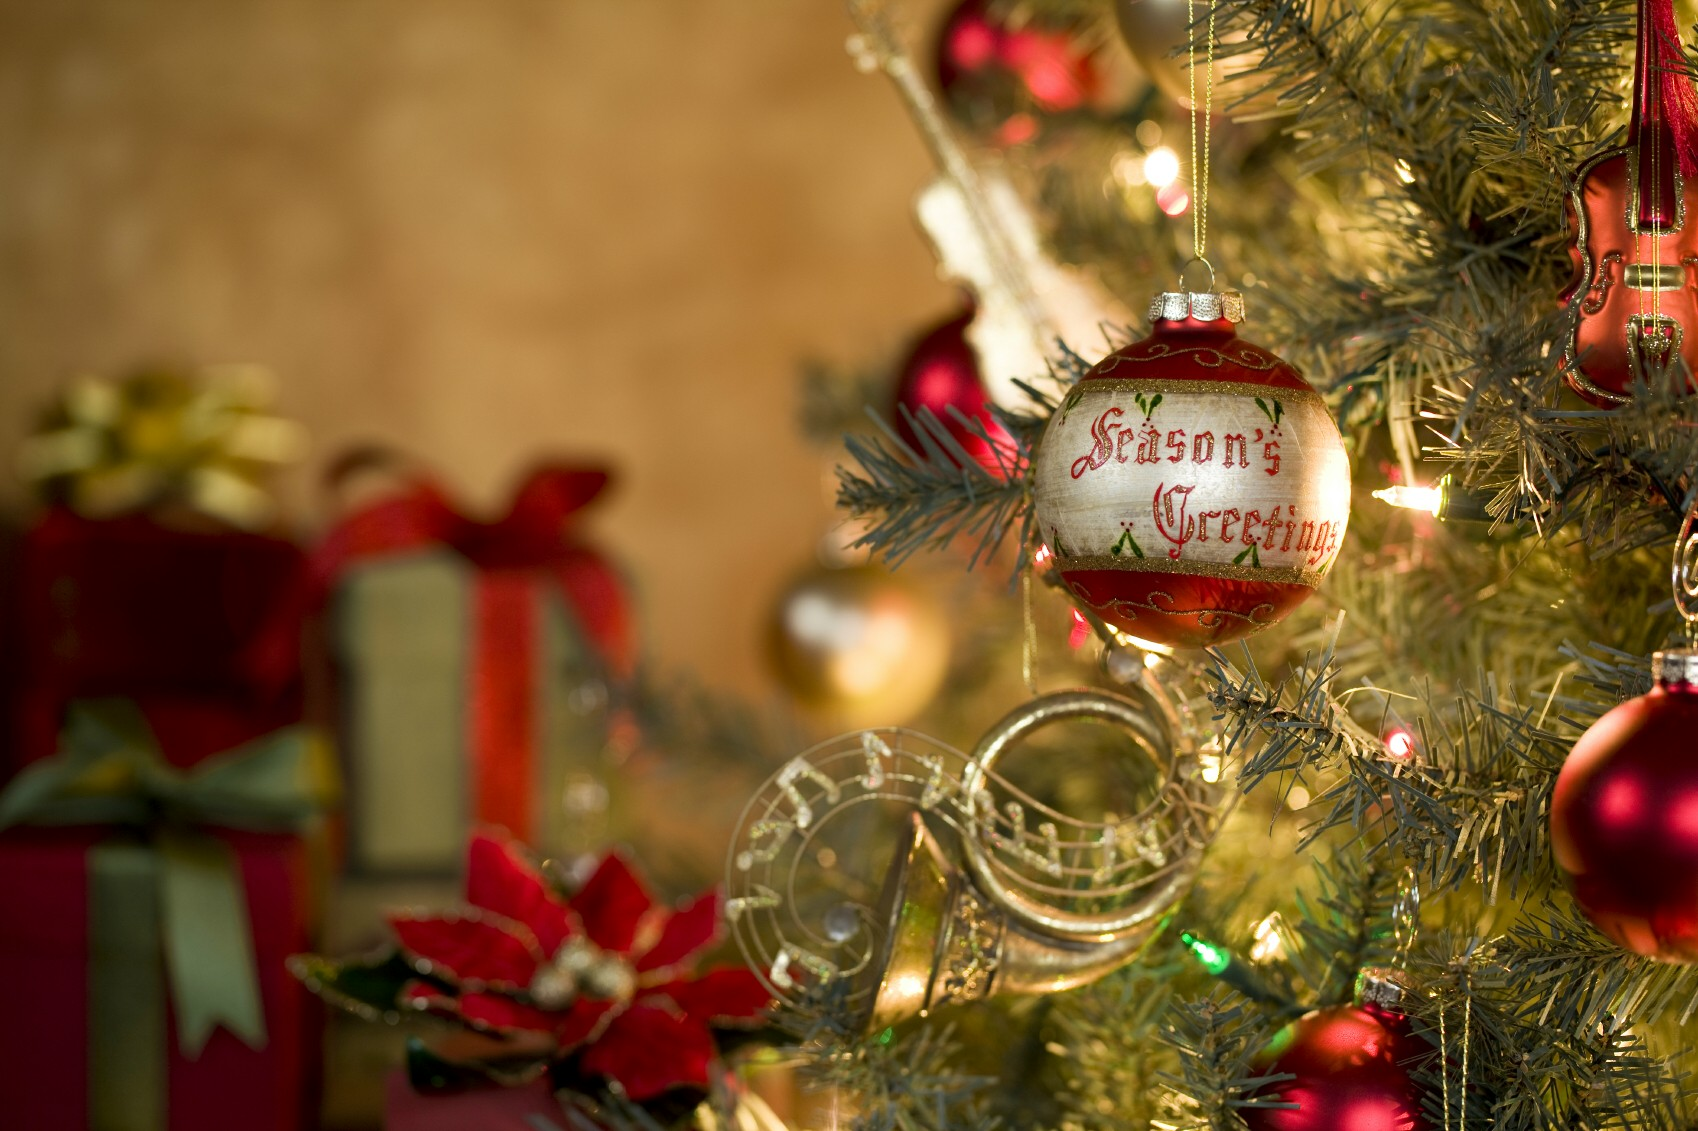 Seasons greetings ornament on tree kodiak electric association seasons greetings ornament on tree m4hsunfo